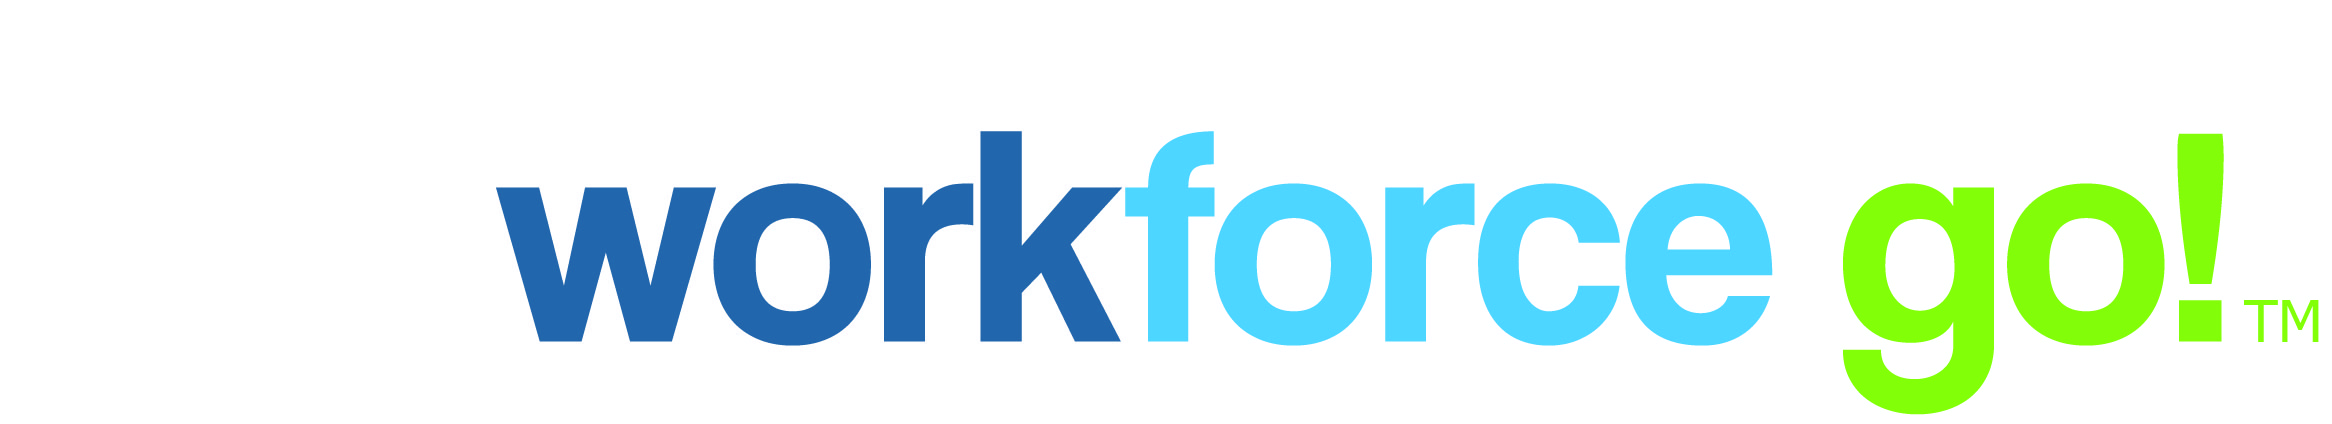 WFG_logo_cmyk CS2.jpg